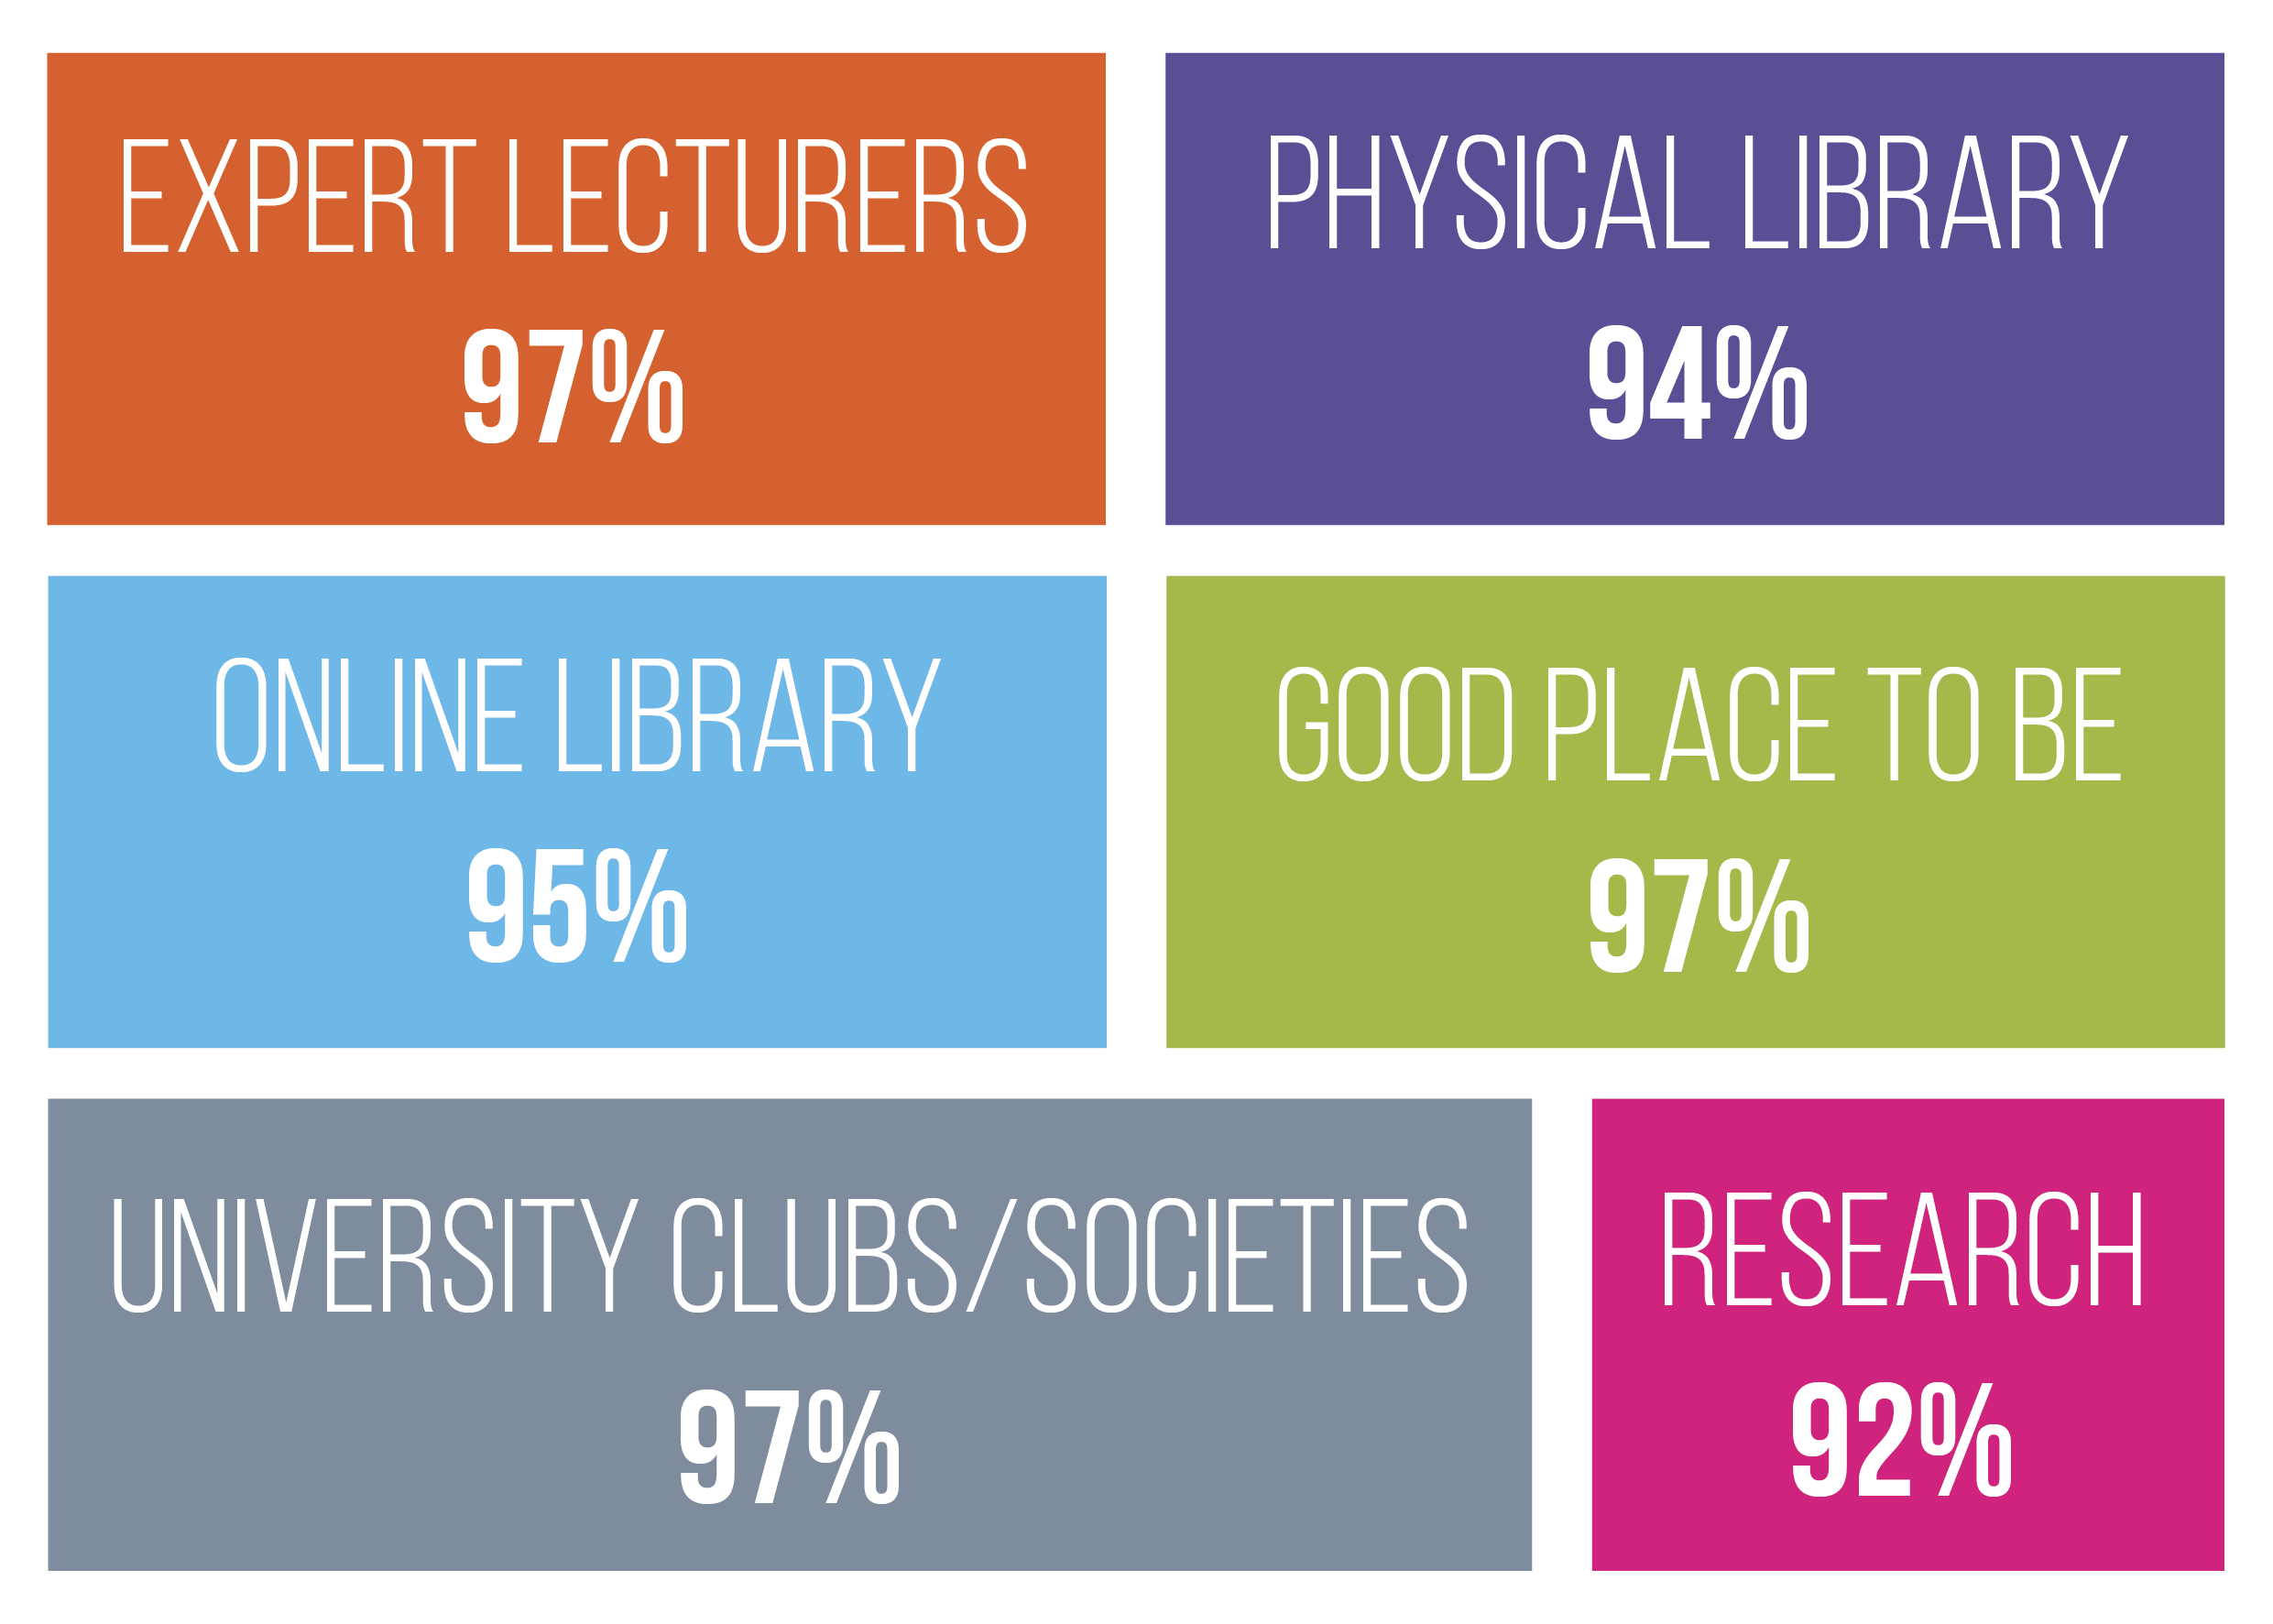 International student satisfaction data